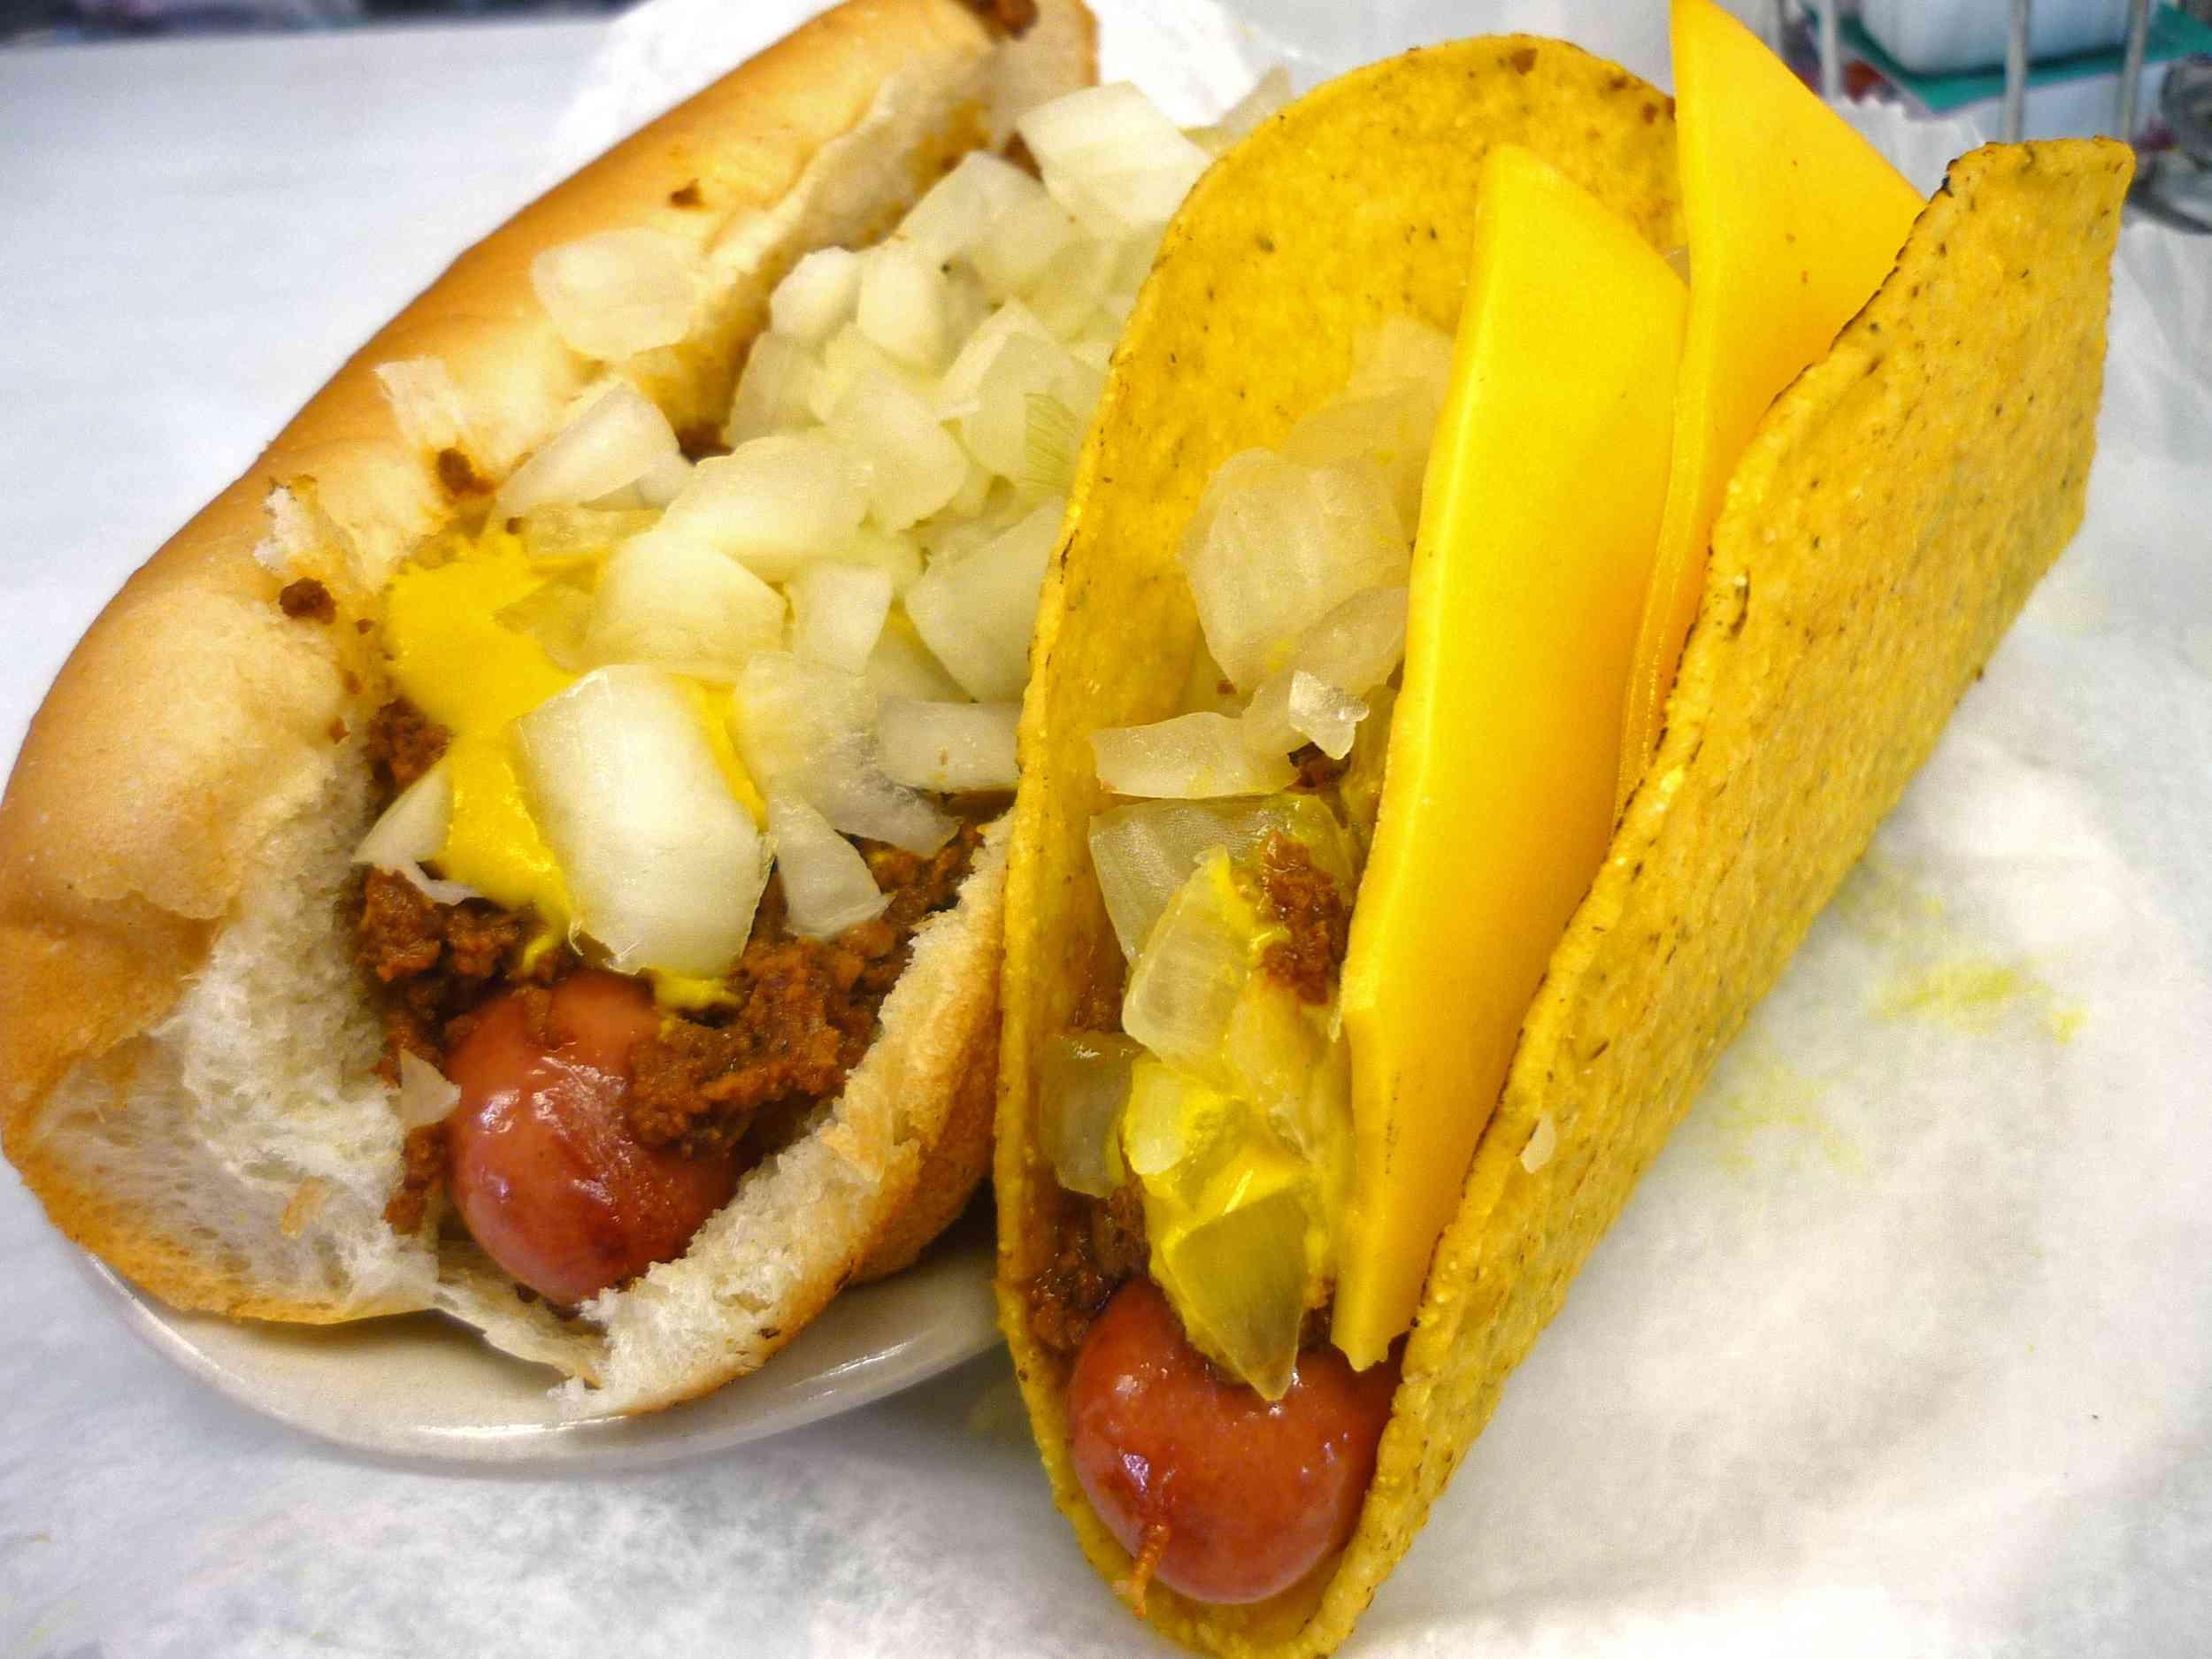 20140701-coney-island-hot-dog-michigan-angelos-coney-dog-taco-Flint-titus-ruscitti.JPG